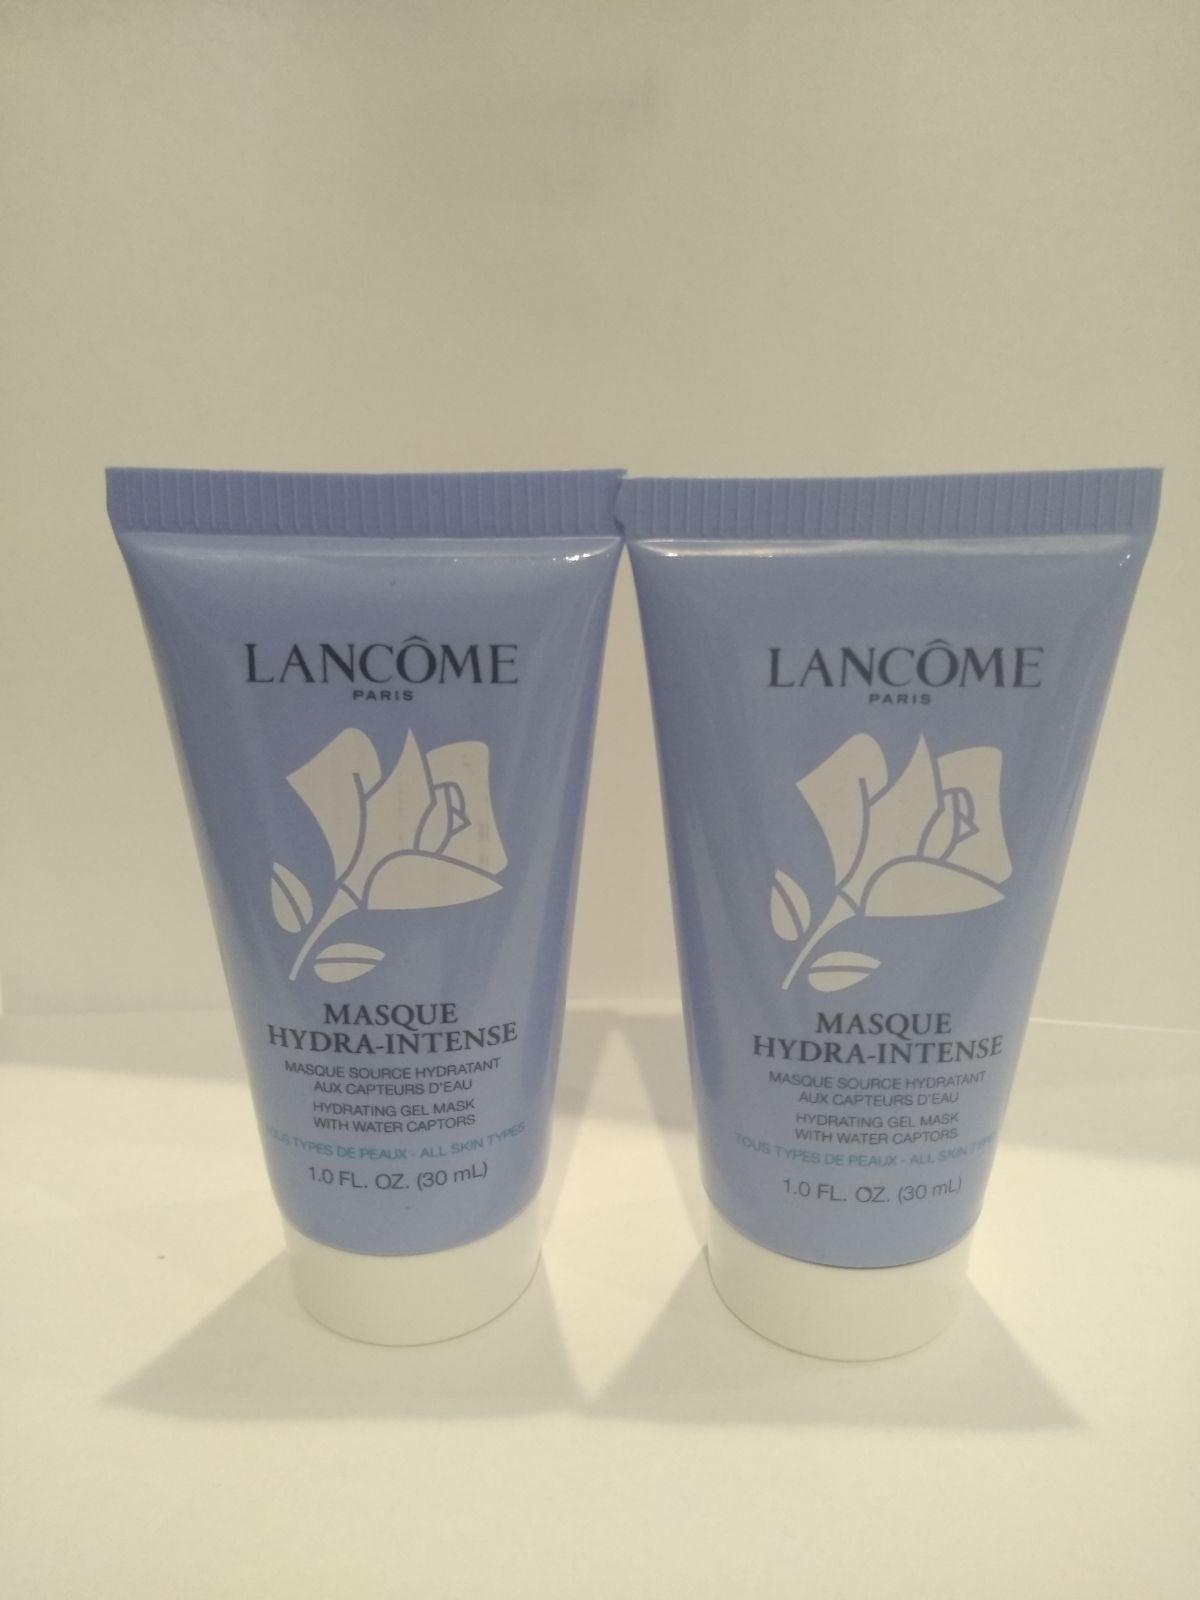 Lancome - 2 x LANCOME HYDRA-INTENSE GEL MASK